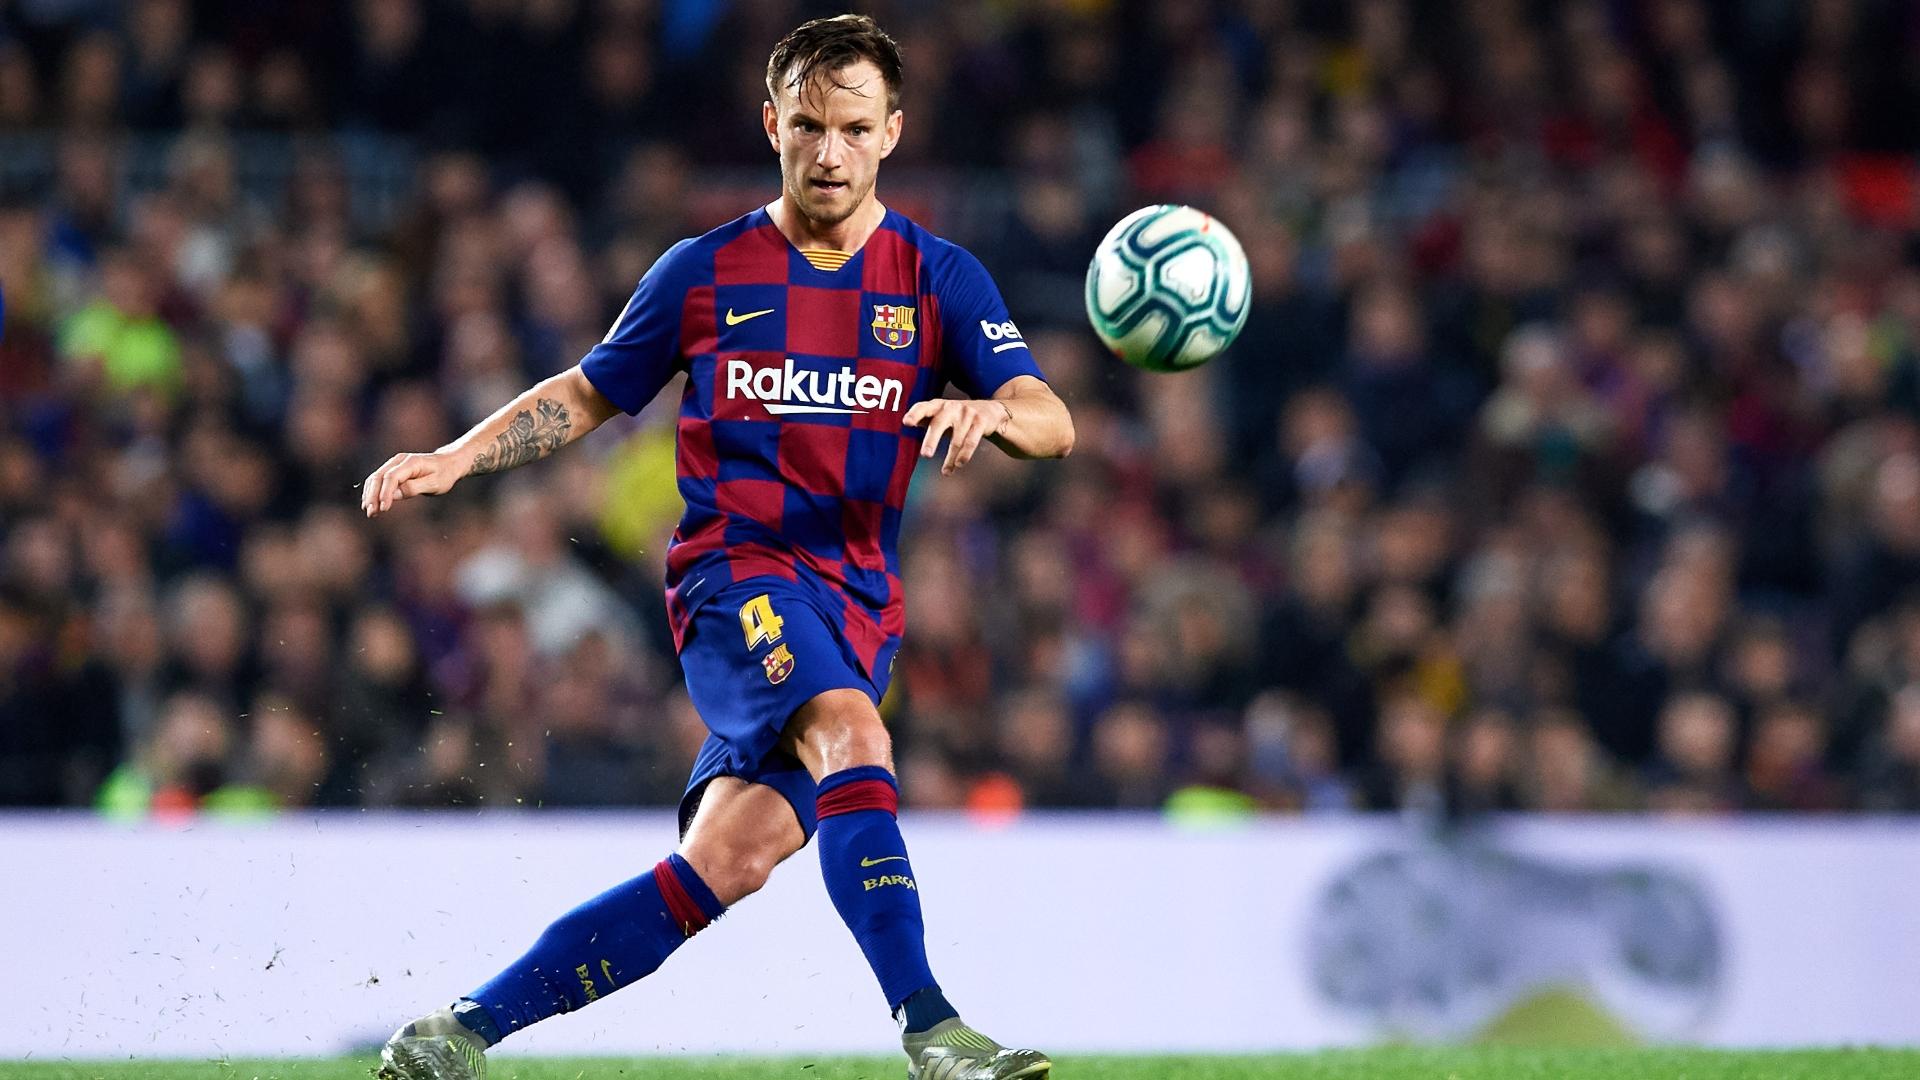 Barcelona set £17.6m asking price for long-term Man Utd target Ivan Rakitic   Read more: https://metro.co.uk/2020/04/02/barcelona-set-17-6m-asking-price-long-term-man-utd-target-ivan-rakitic-12501574/?ITO=squid&ito=newsnow-feed?ito=cbshare  Twitter: https://twitter.com/MetroUK | Facebook: https://www.facebook.com/MetroUK/ - Bóng Đá